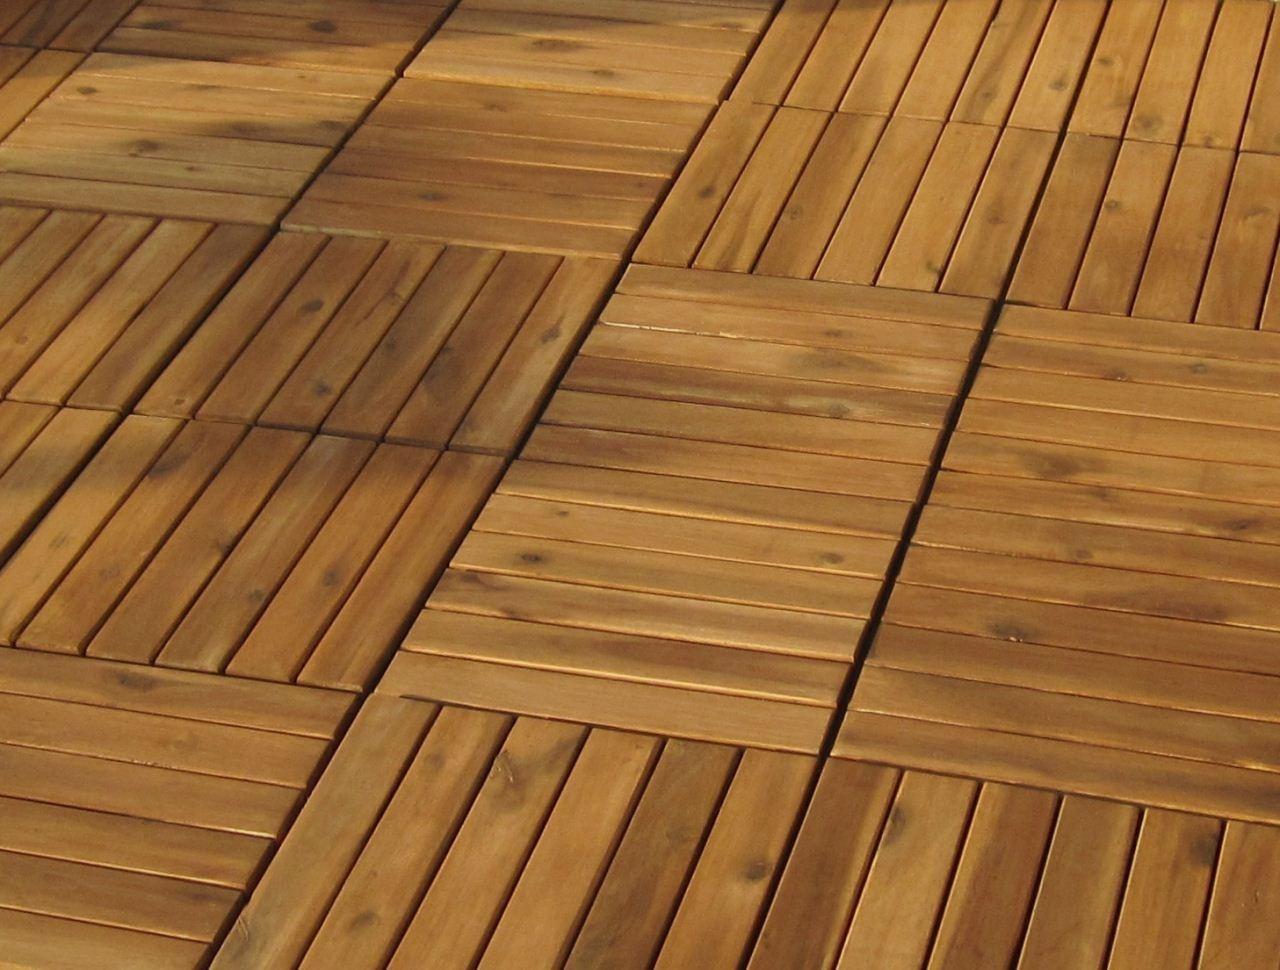 terrassenfliesen verlegen herget produktinformation. Black Bedroom Furniture Sets. Home Design Ideas